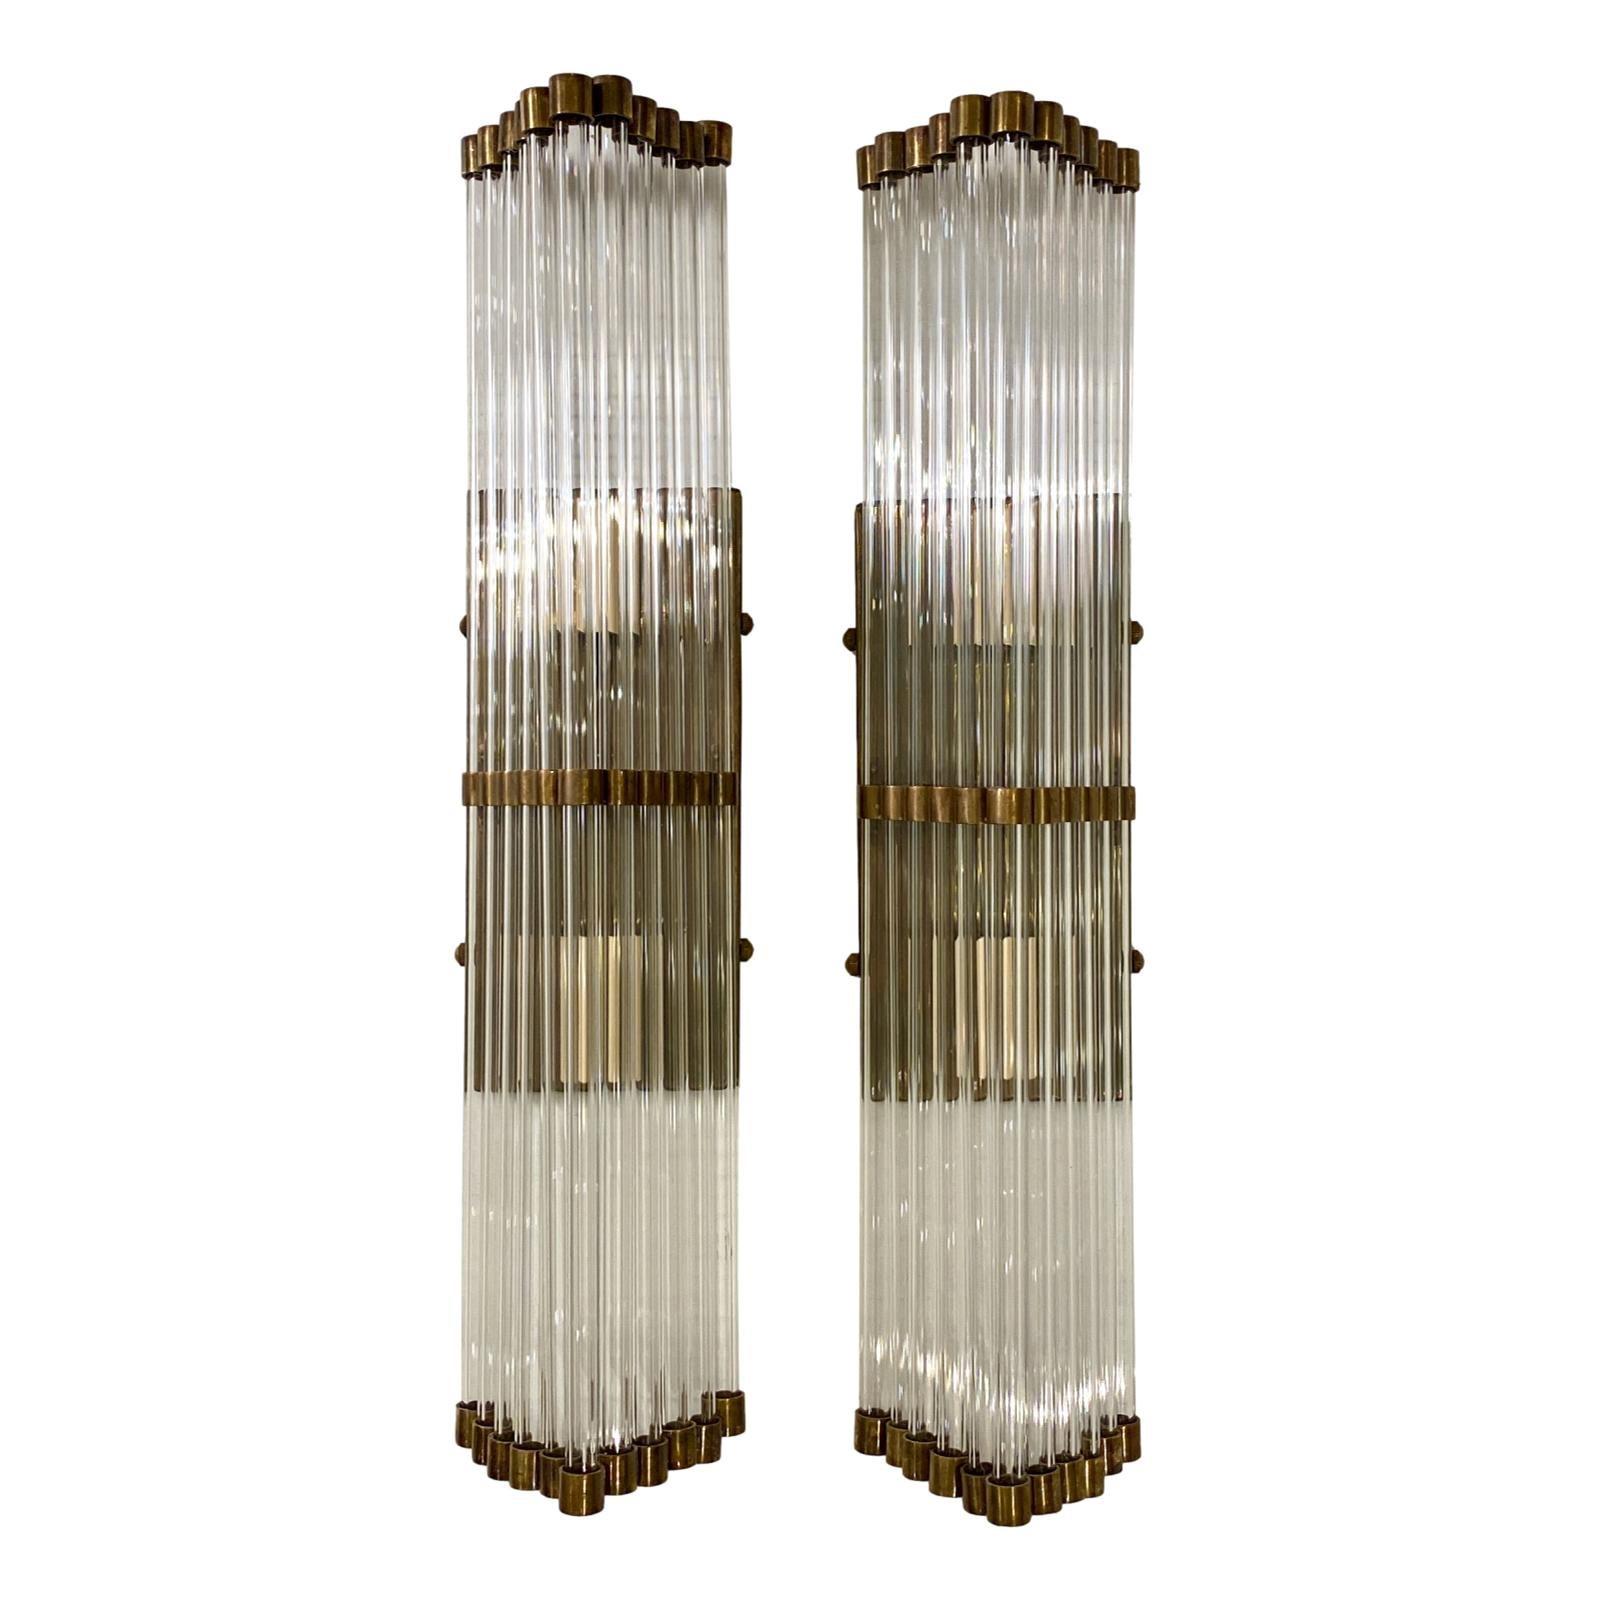 Set of Glass Rod Sconces, Sold per Pair